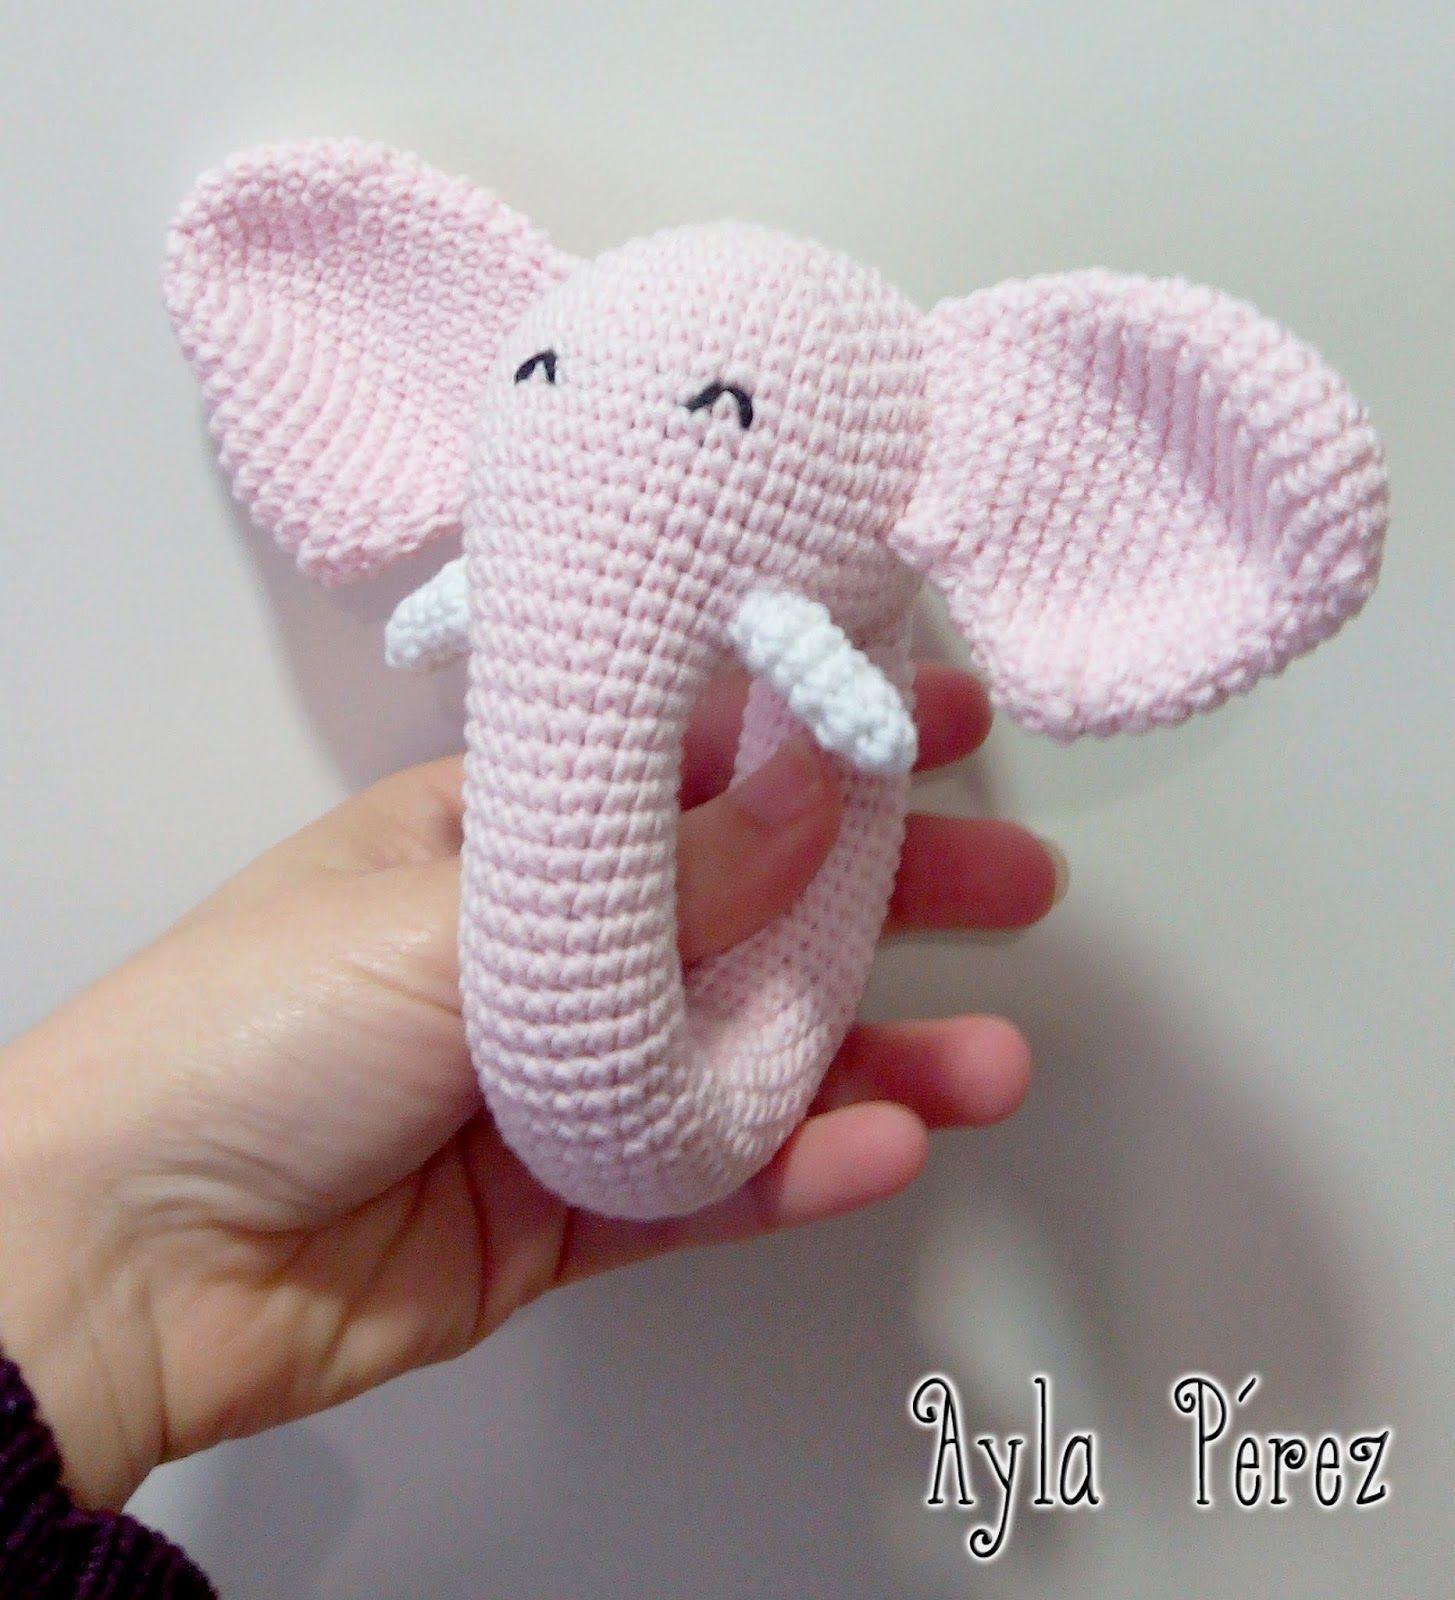 Ayla\'s Crafts : Sonajero Elefante | amigurumi | Pinterest | Sonajero ...